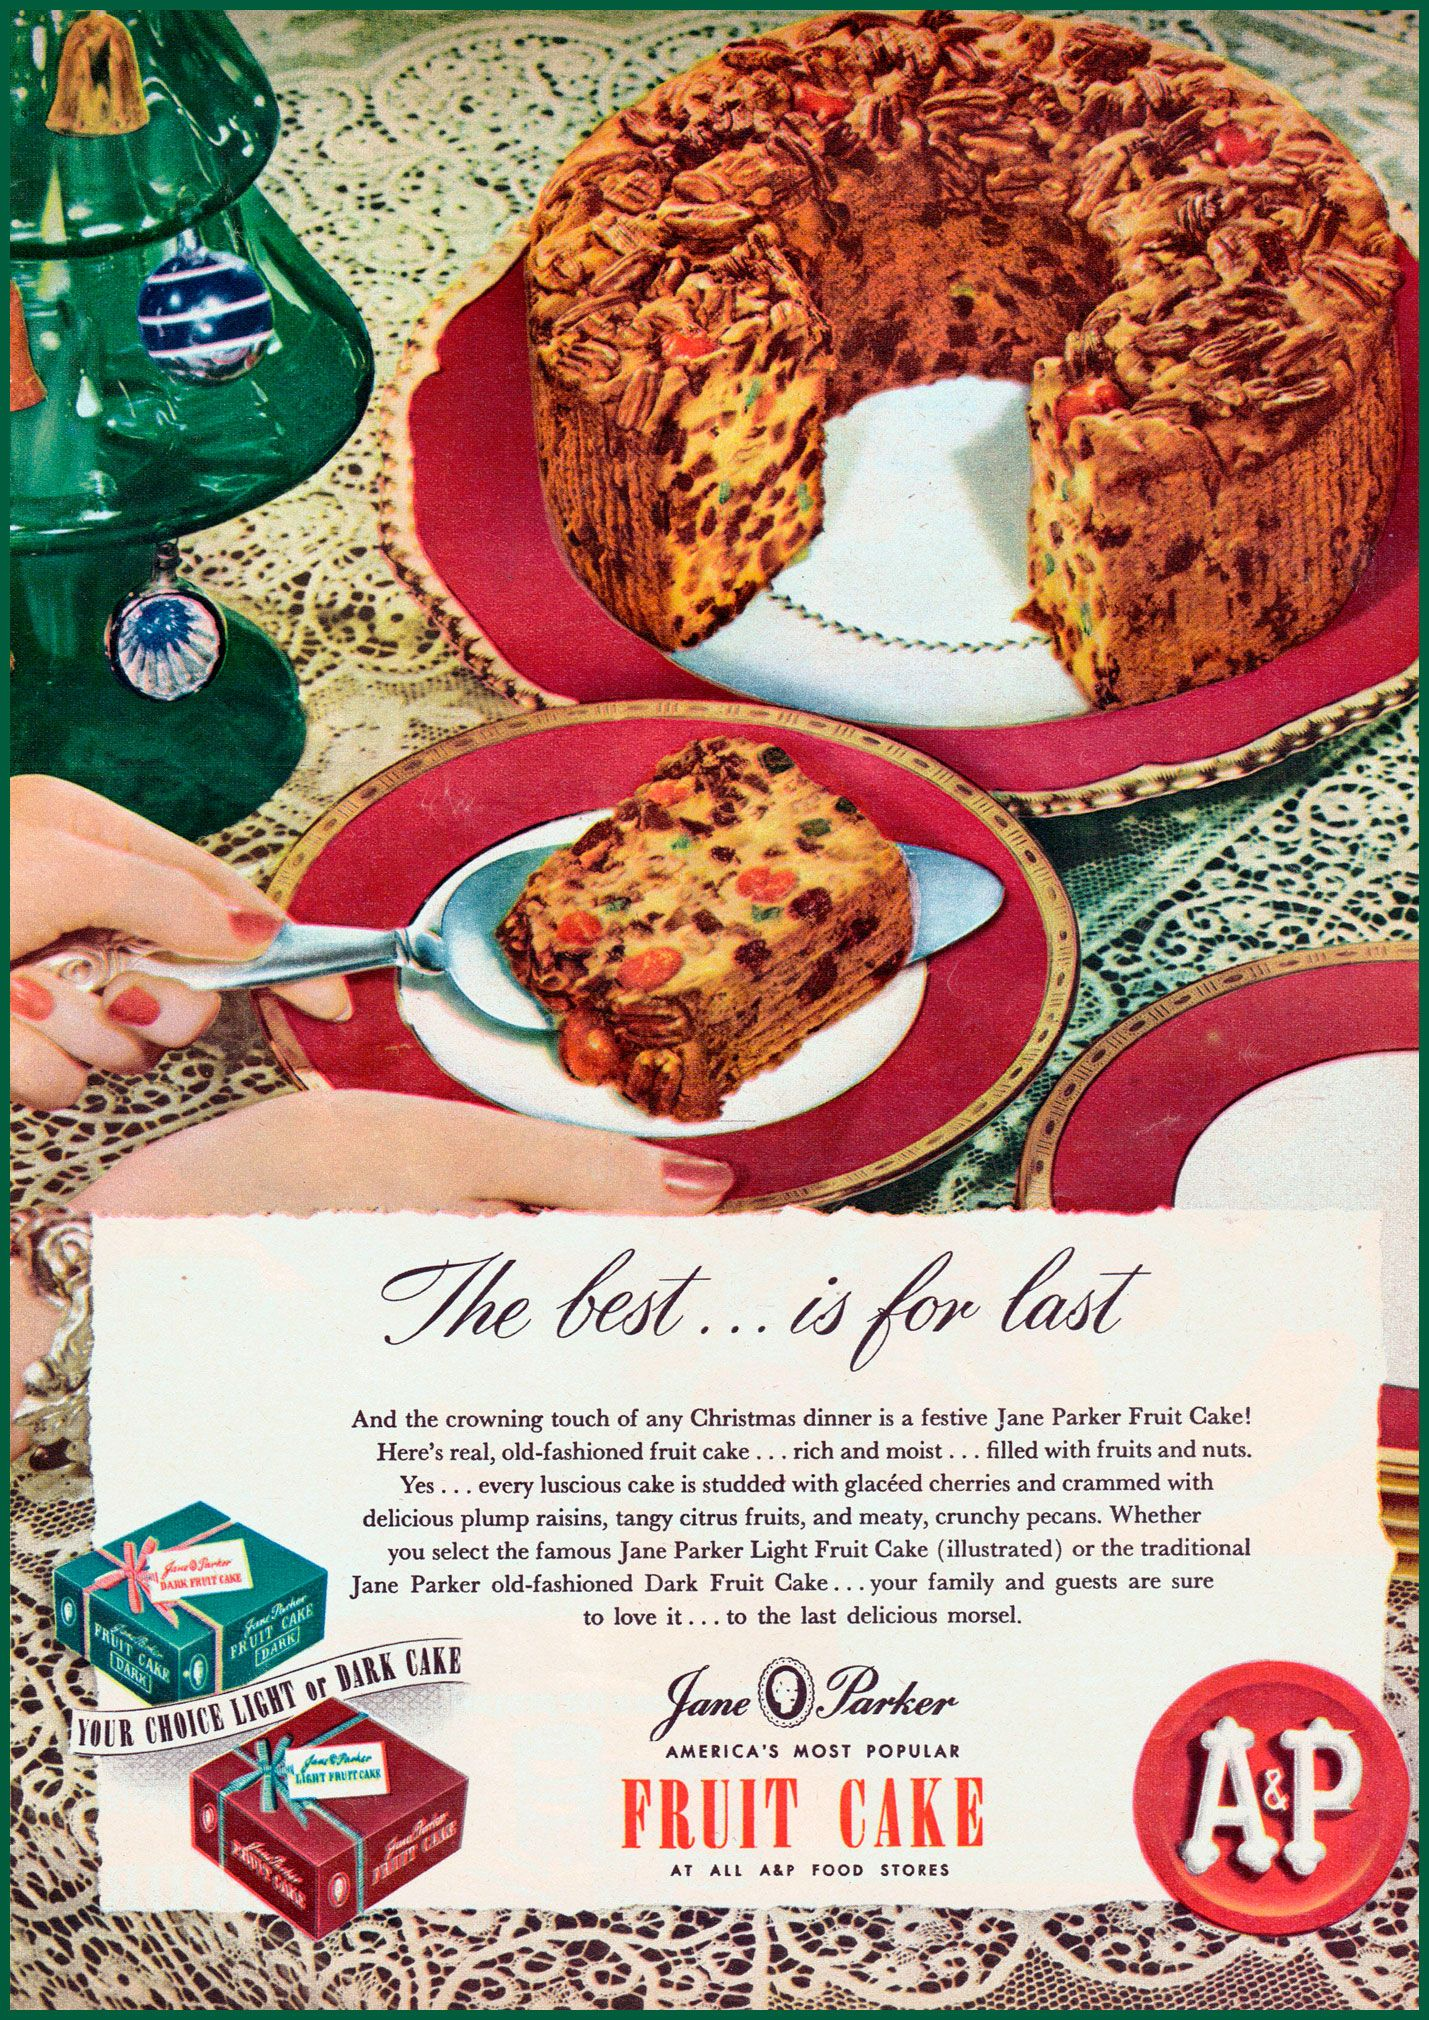 jane parker fruit cake ingredients